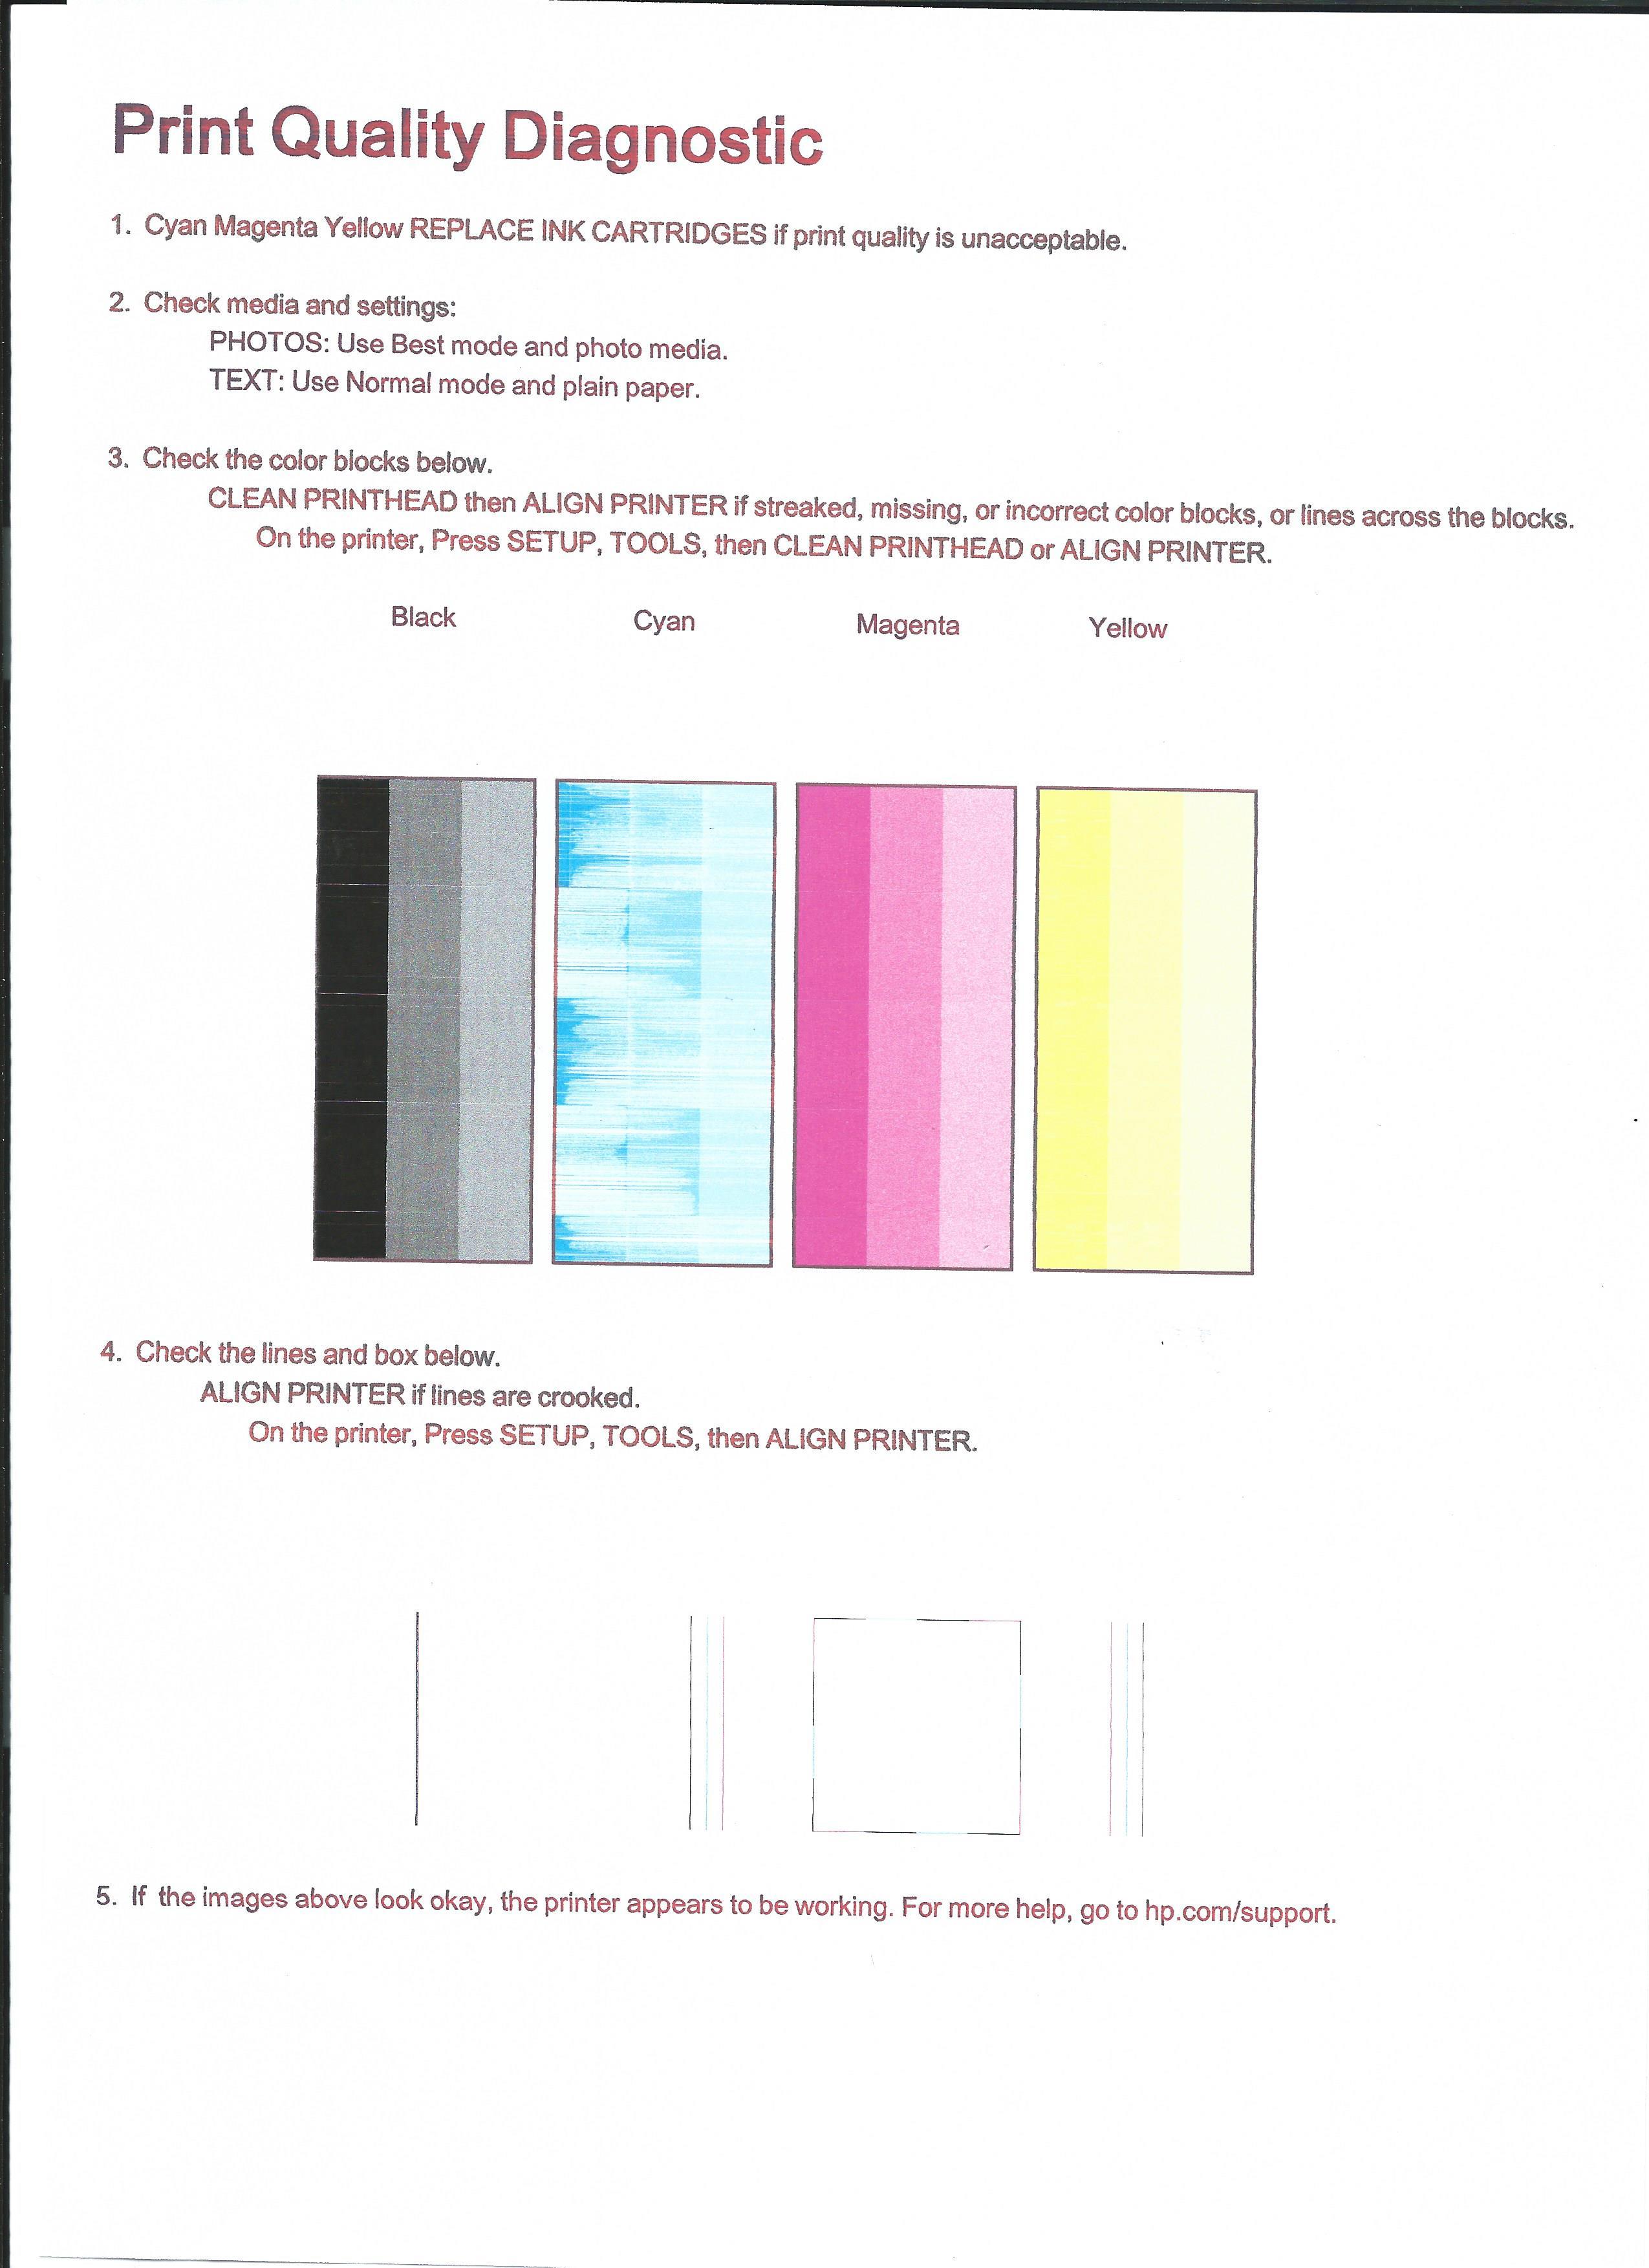 hp photosmart 5520 problem solving